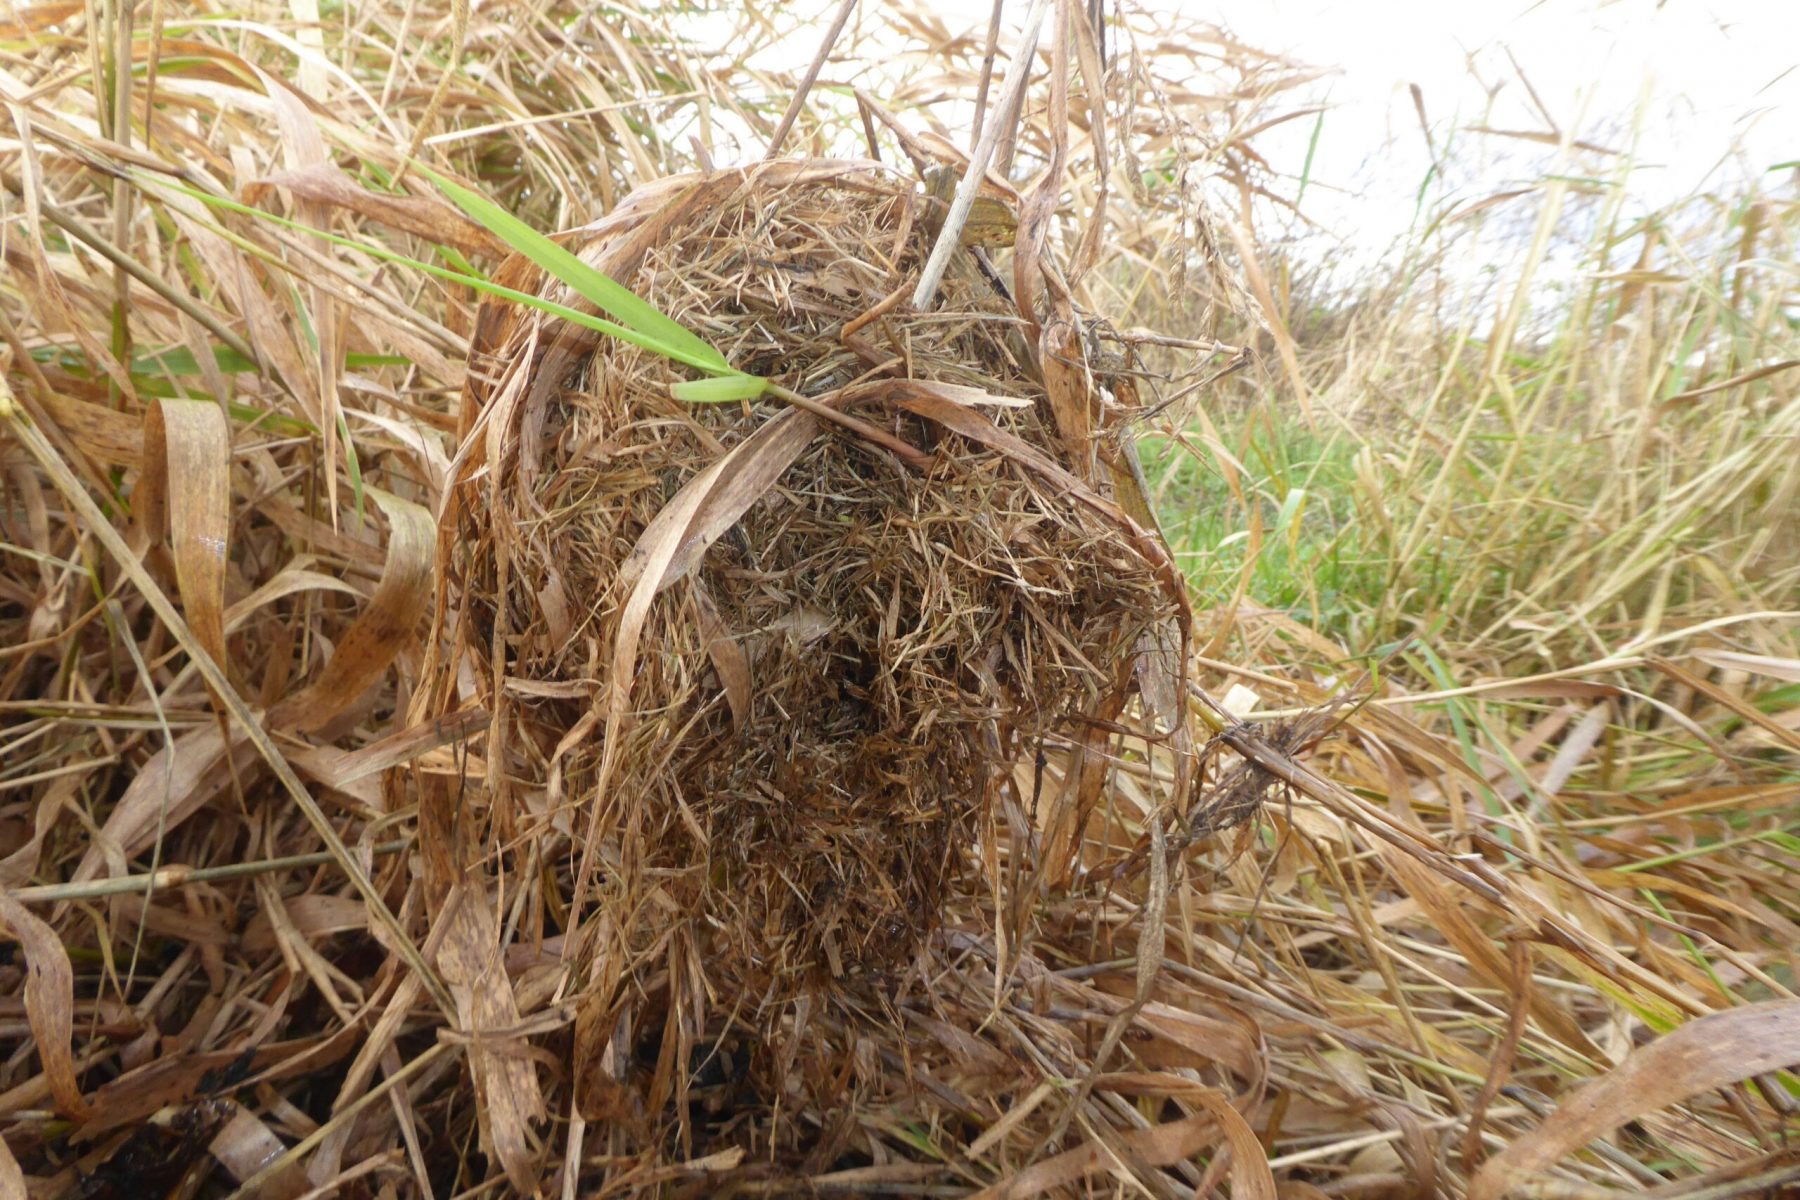 Harvest mouse (Micromys minutus), nursery nest,  Auckley